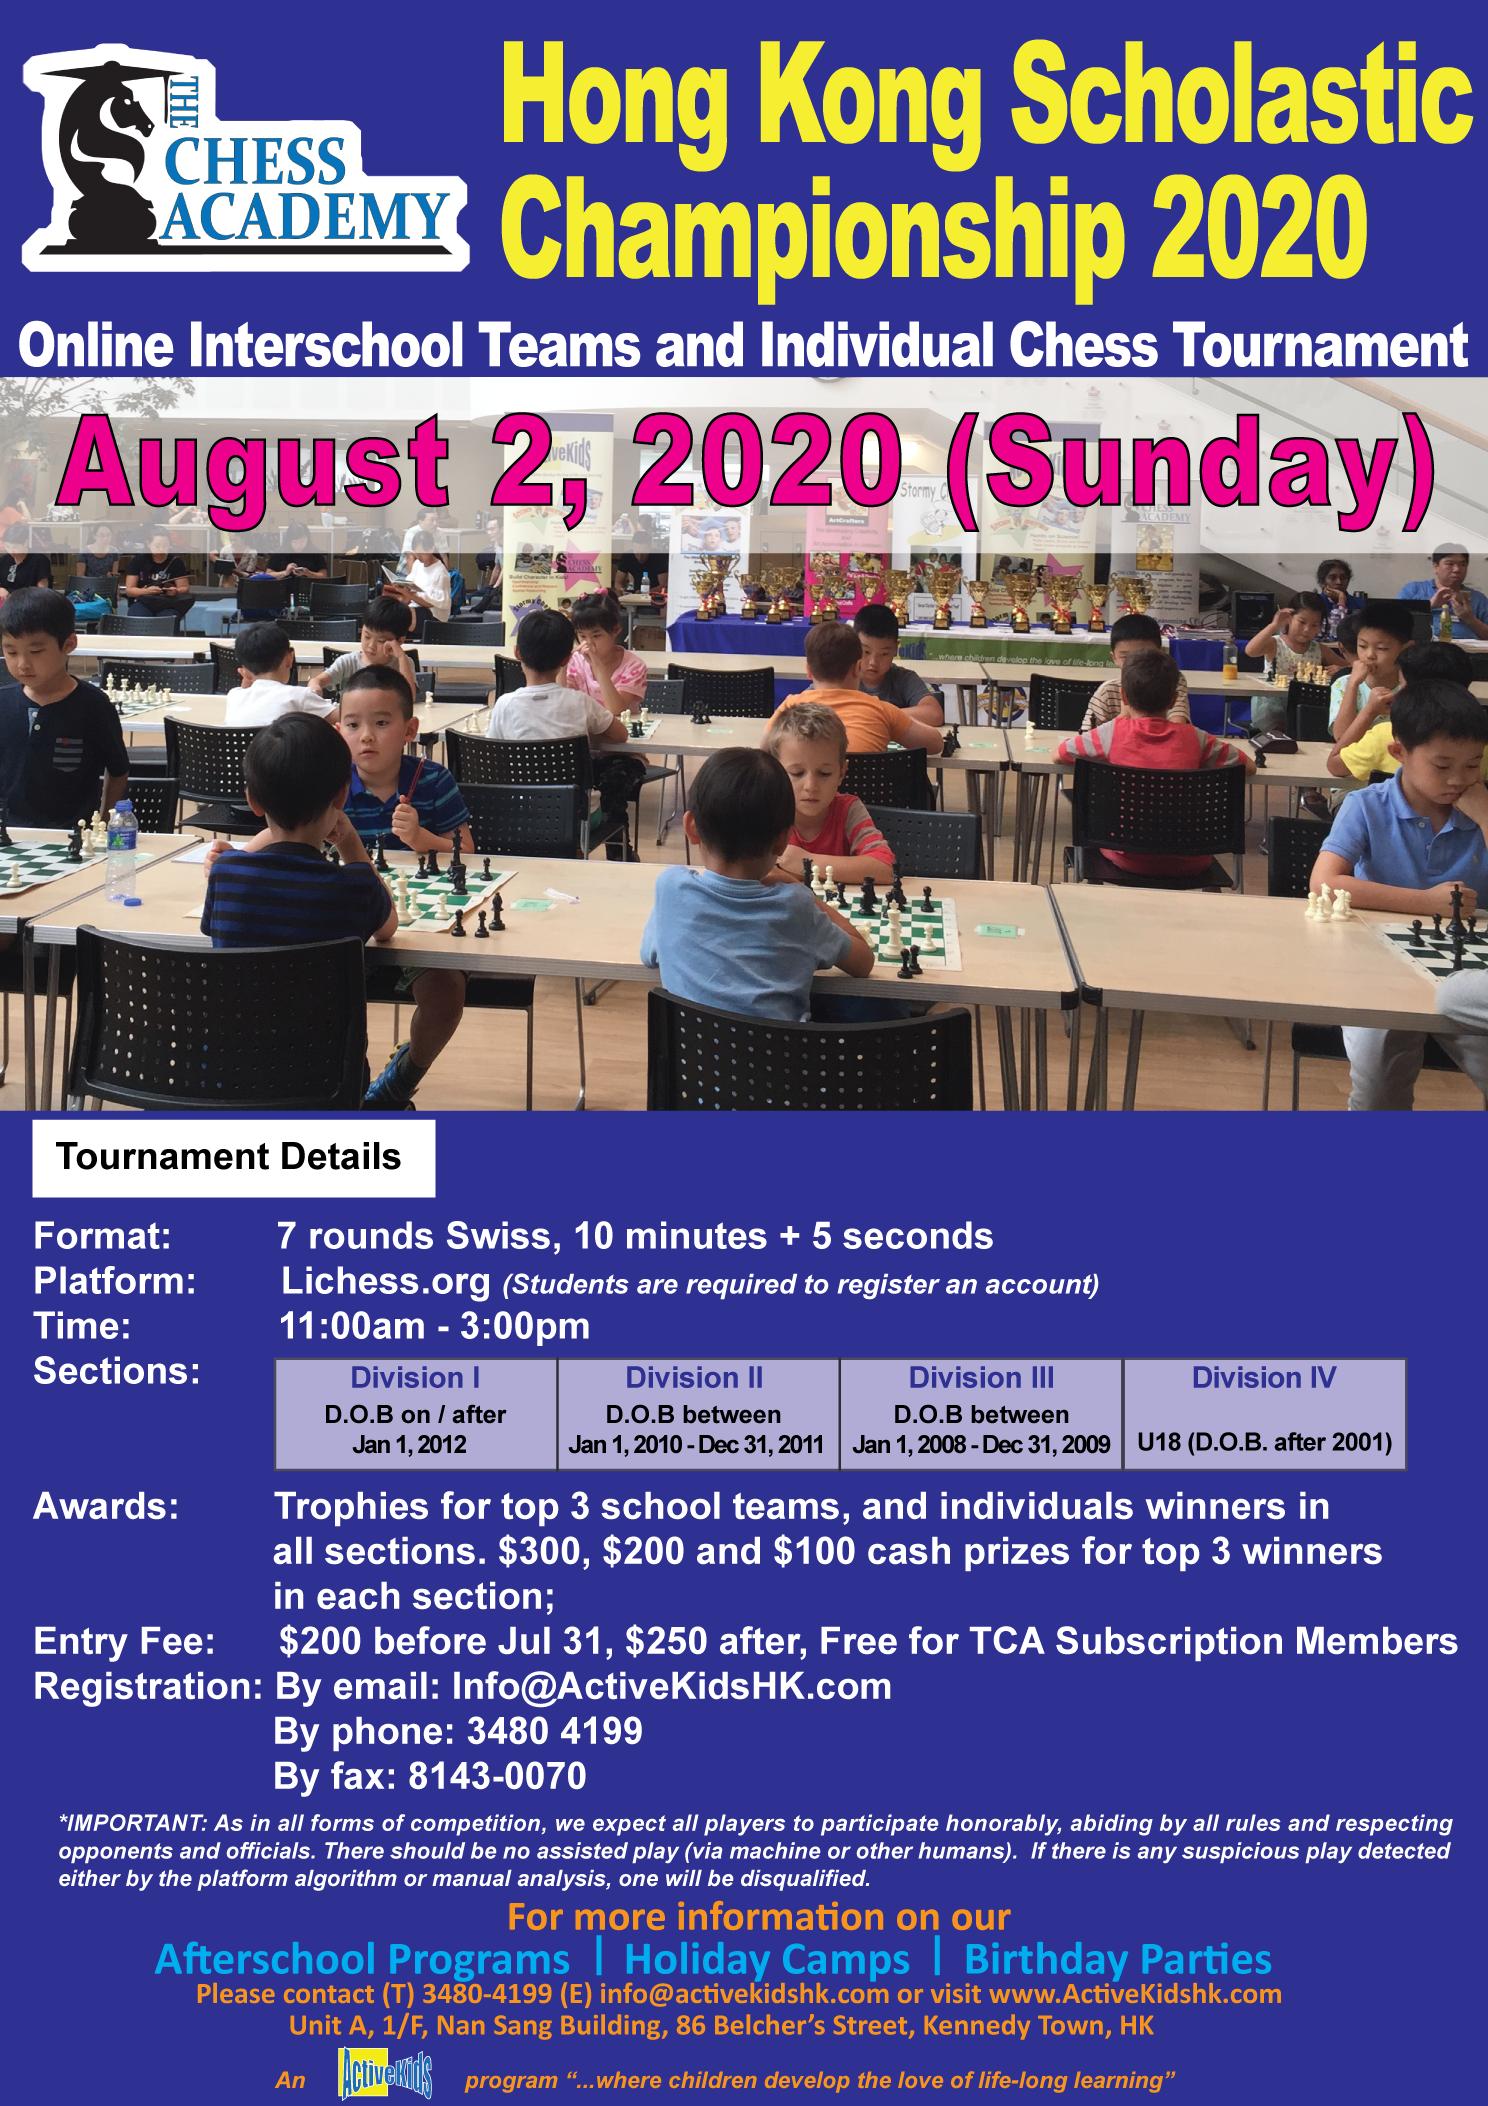 Scholastic-Championship-2020_Aug_2